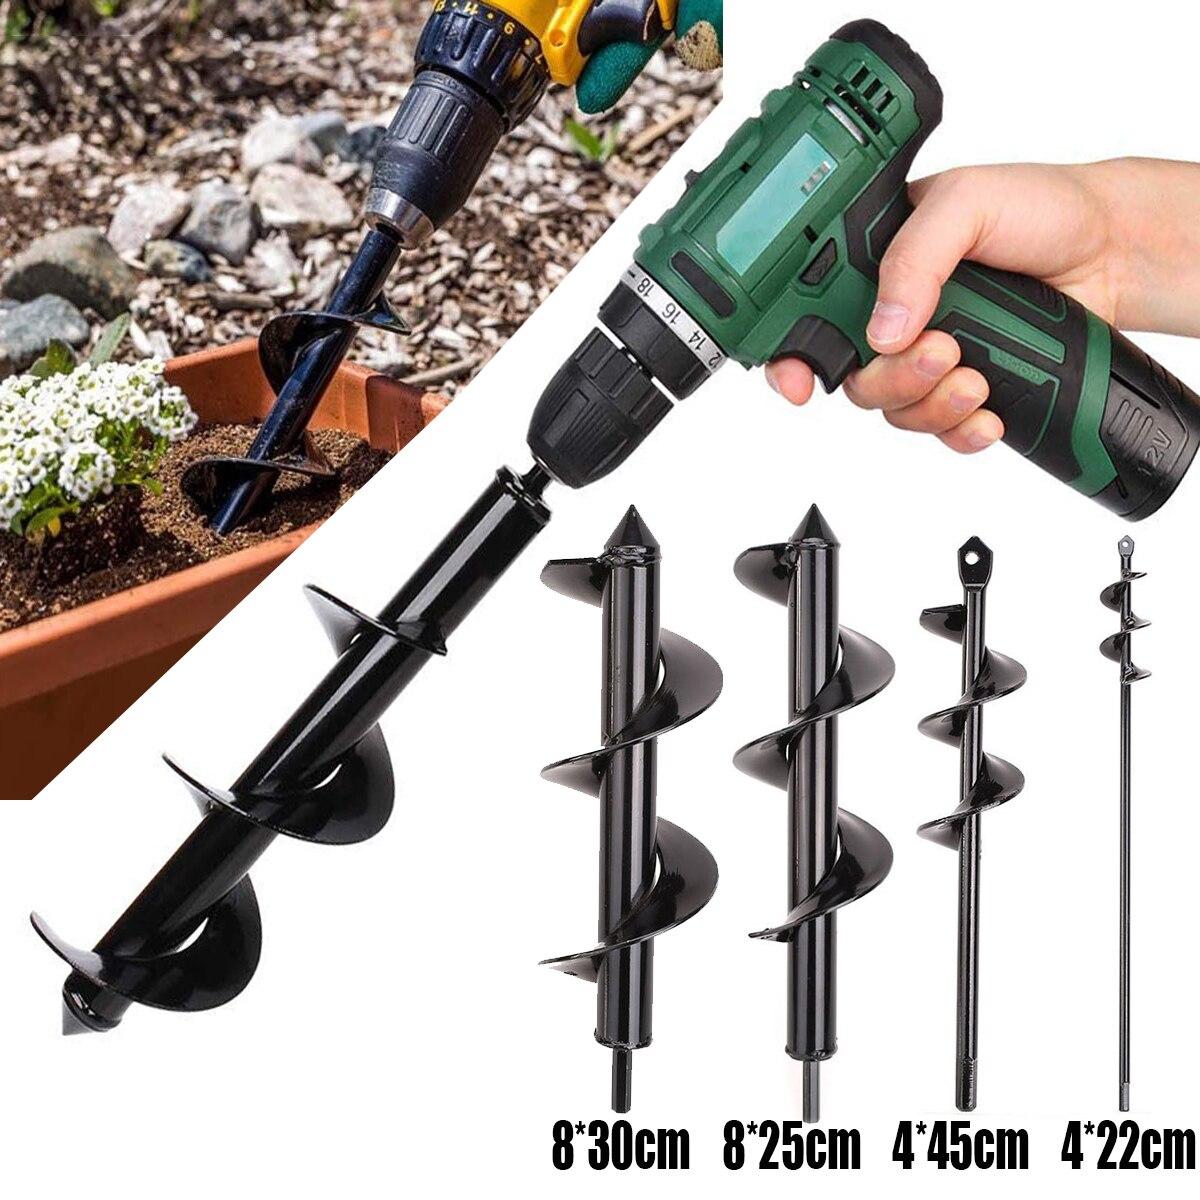 Garden Auger Spiral Drill Bit Roto Flower Planter Bulb HEX Shaft Drill Auger Yard Gardening Bedding Planting Hole Digger Tool